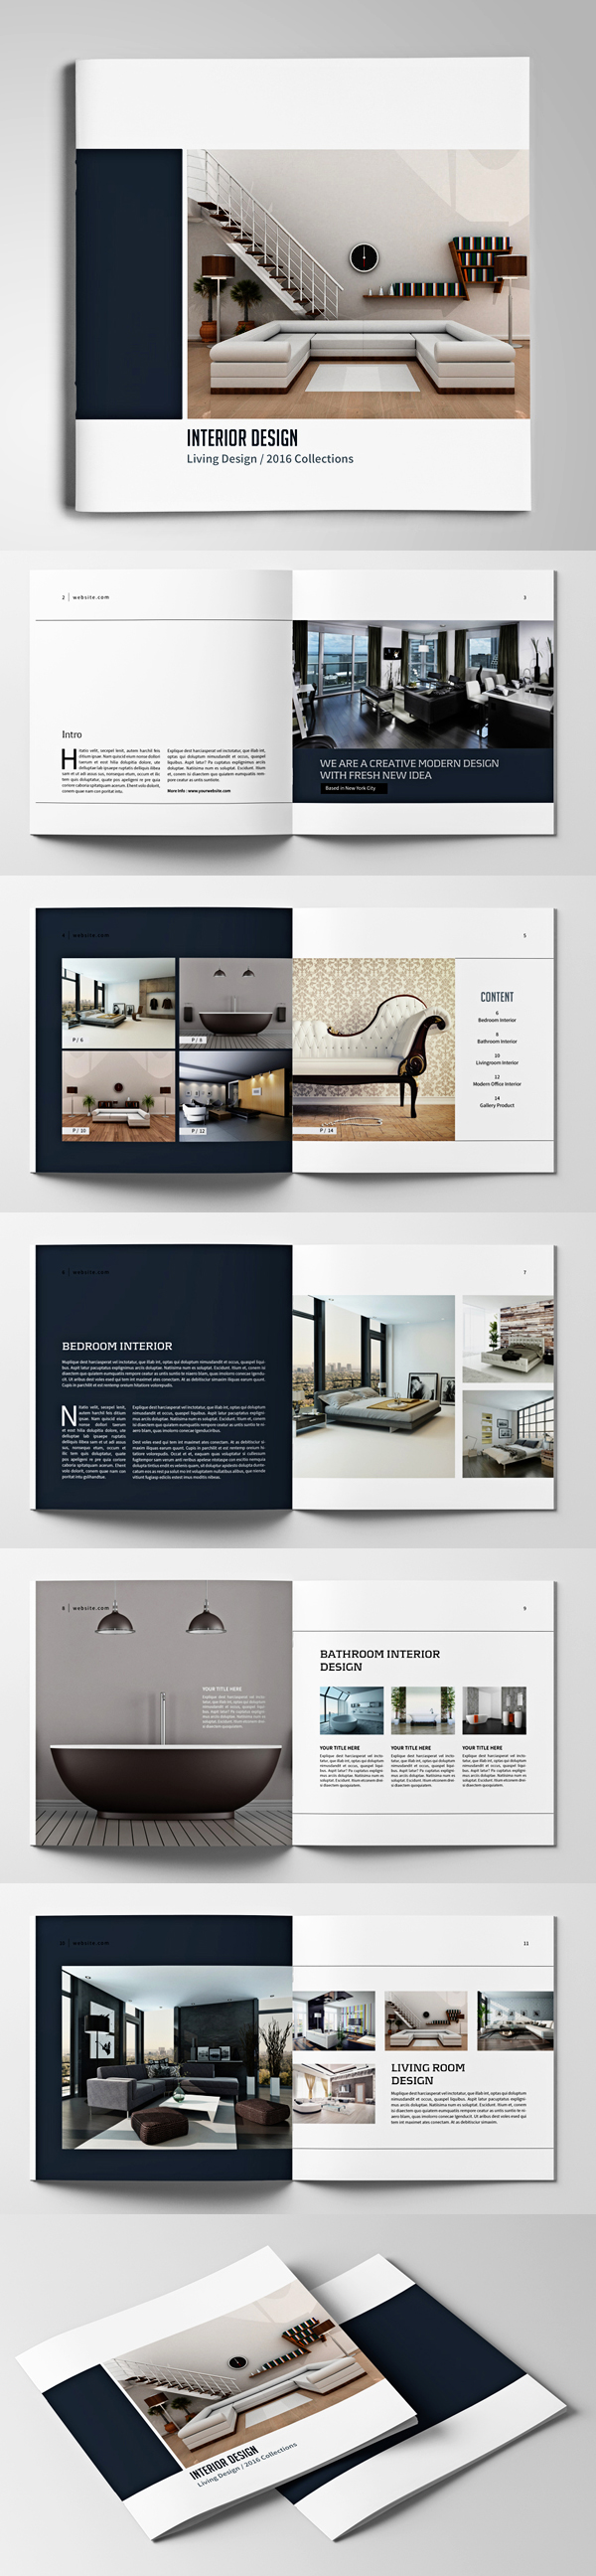 100 Professional Corporate Brochure Templates - 10